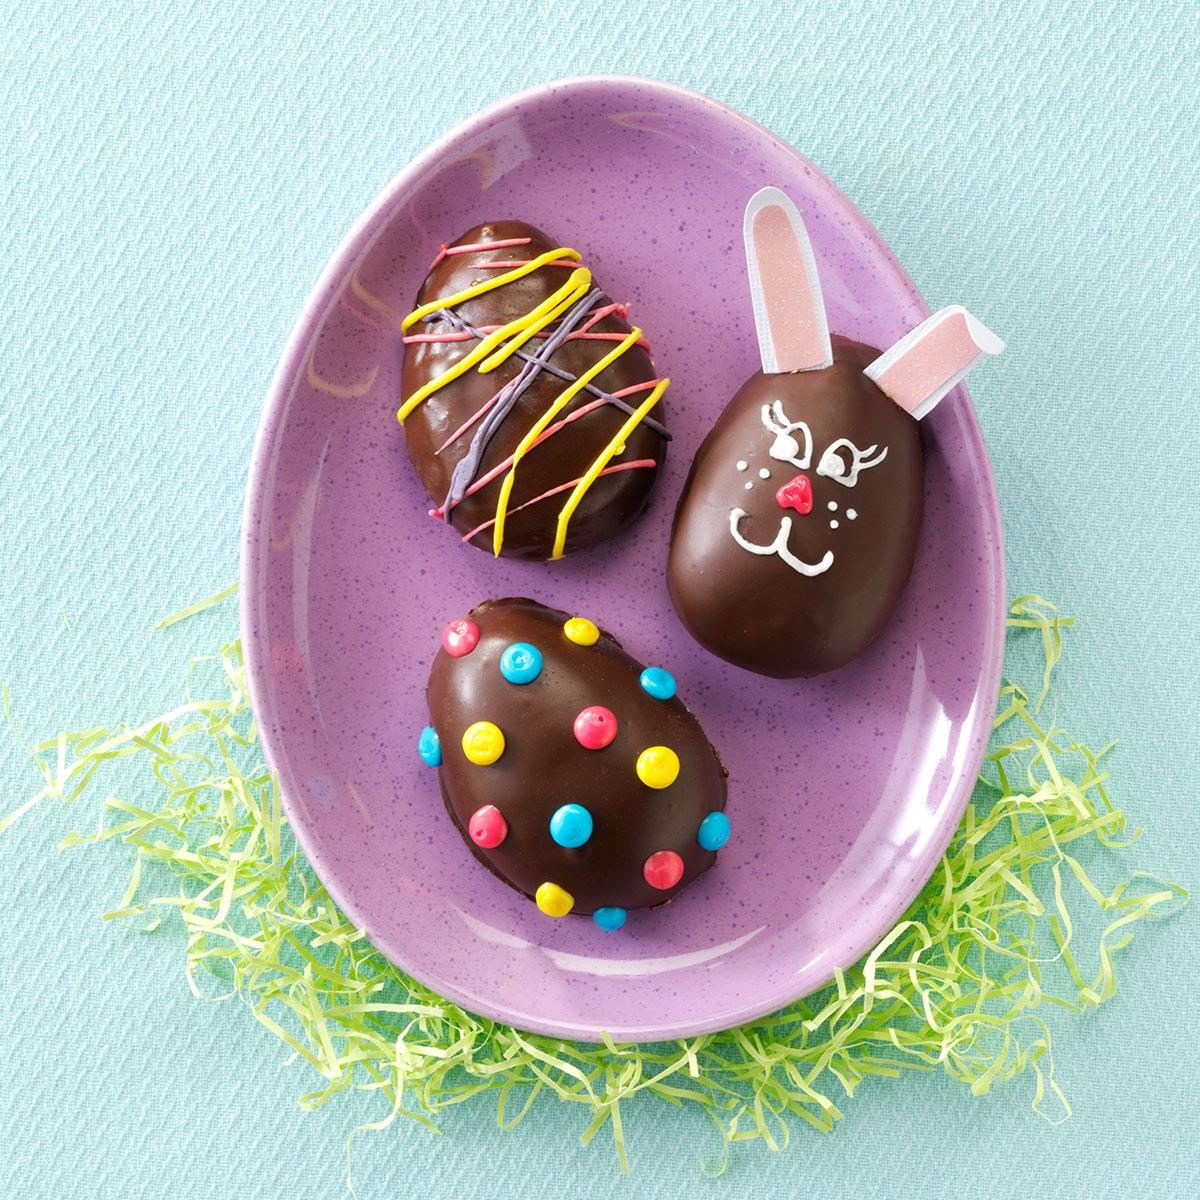 Homemade Chocolate Covered Marshmallow Eggs | Crazy Homemade